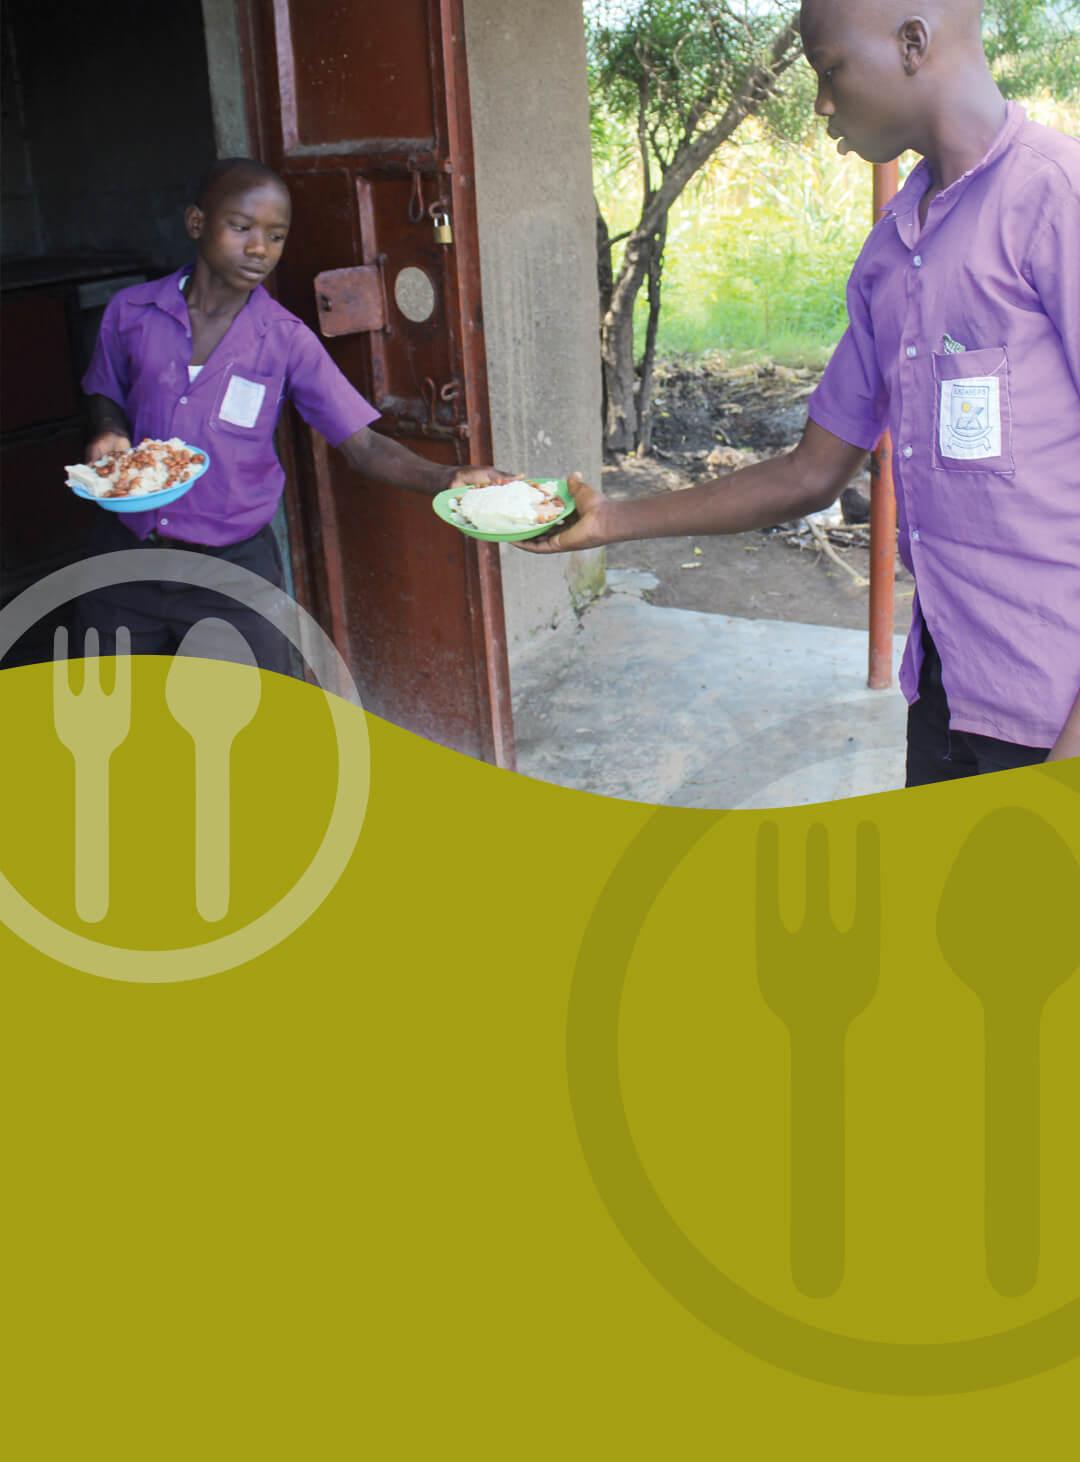 A Ugandan boy (Protas) hands out school meals to his classmates